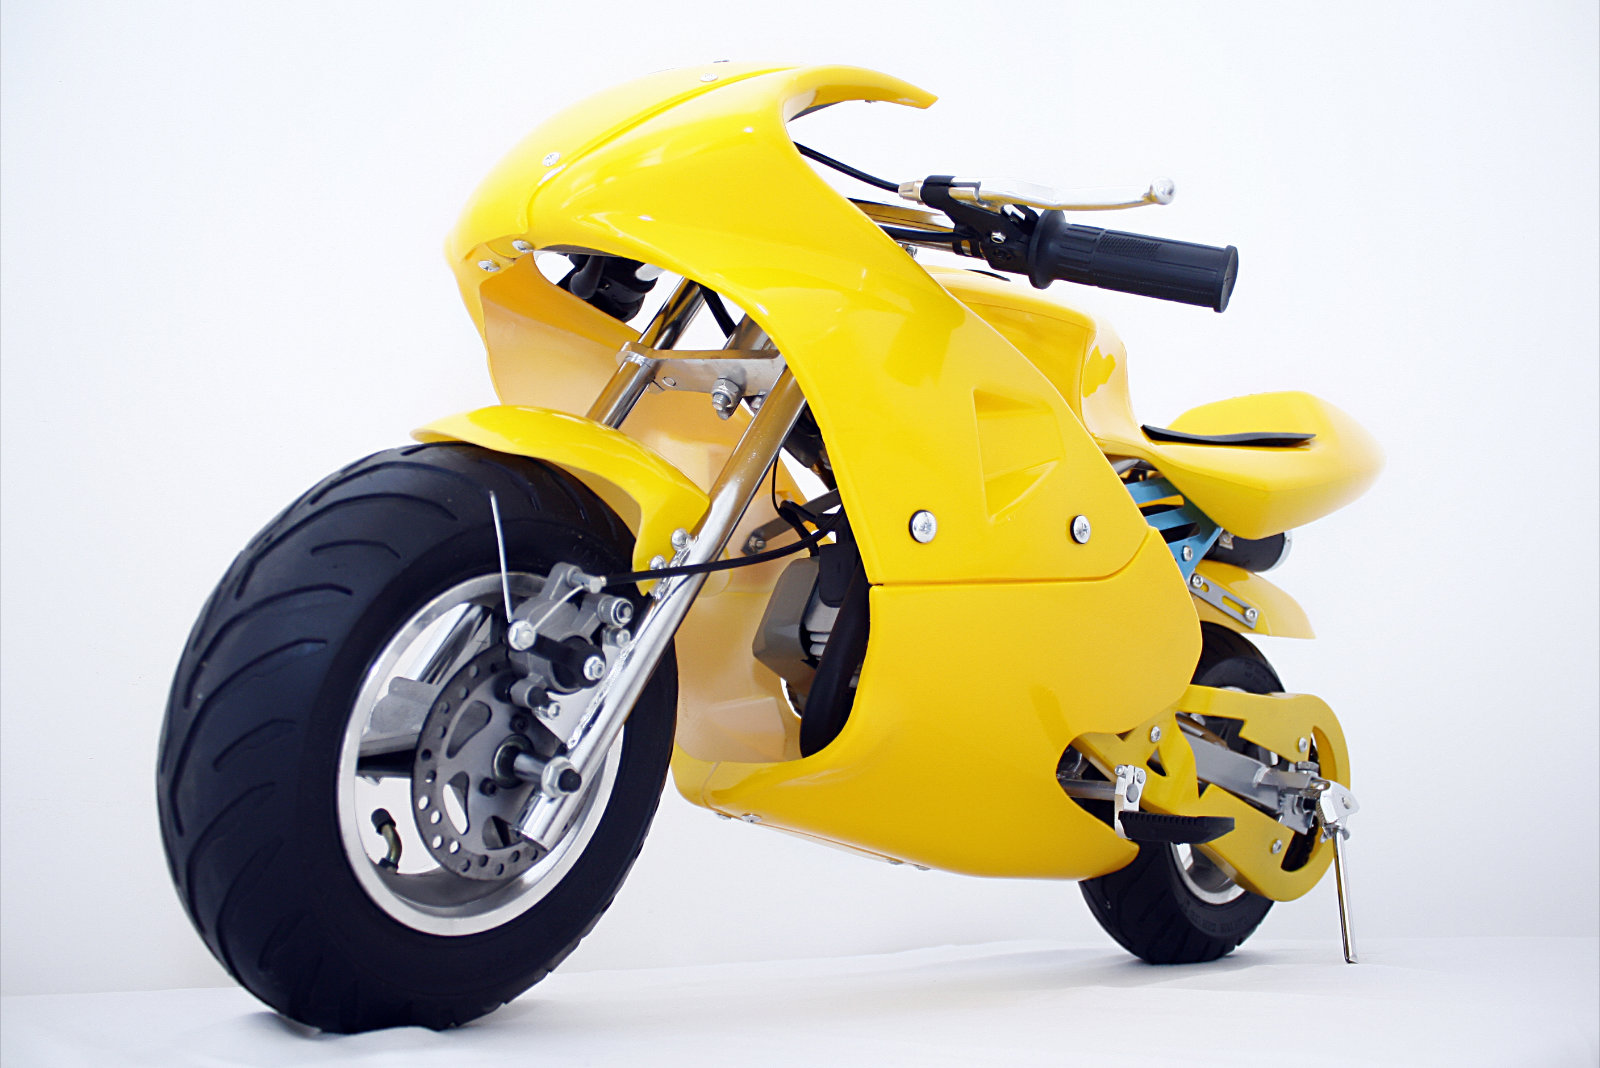 ve culos moto sport 49 cc. Black Bedroom Furniture Sets. Home Design Ideas